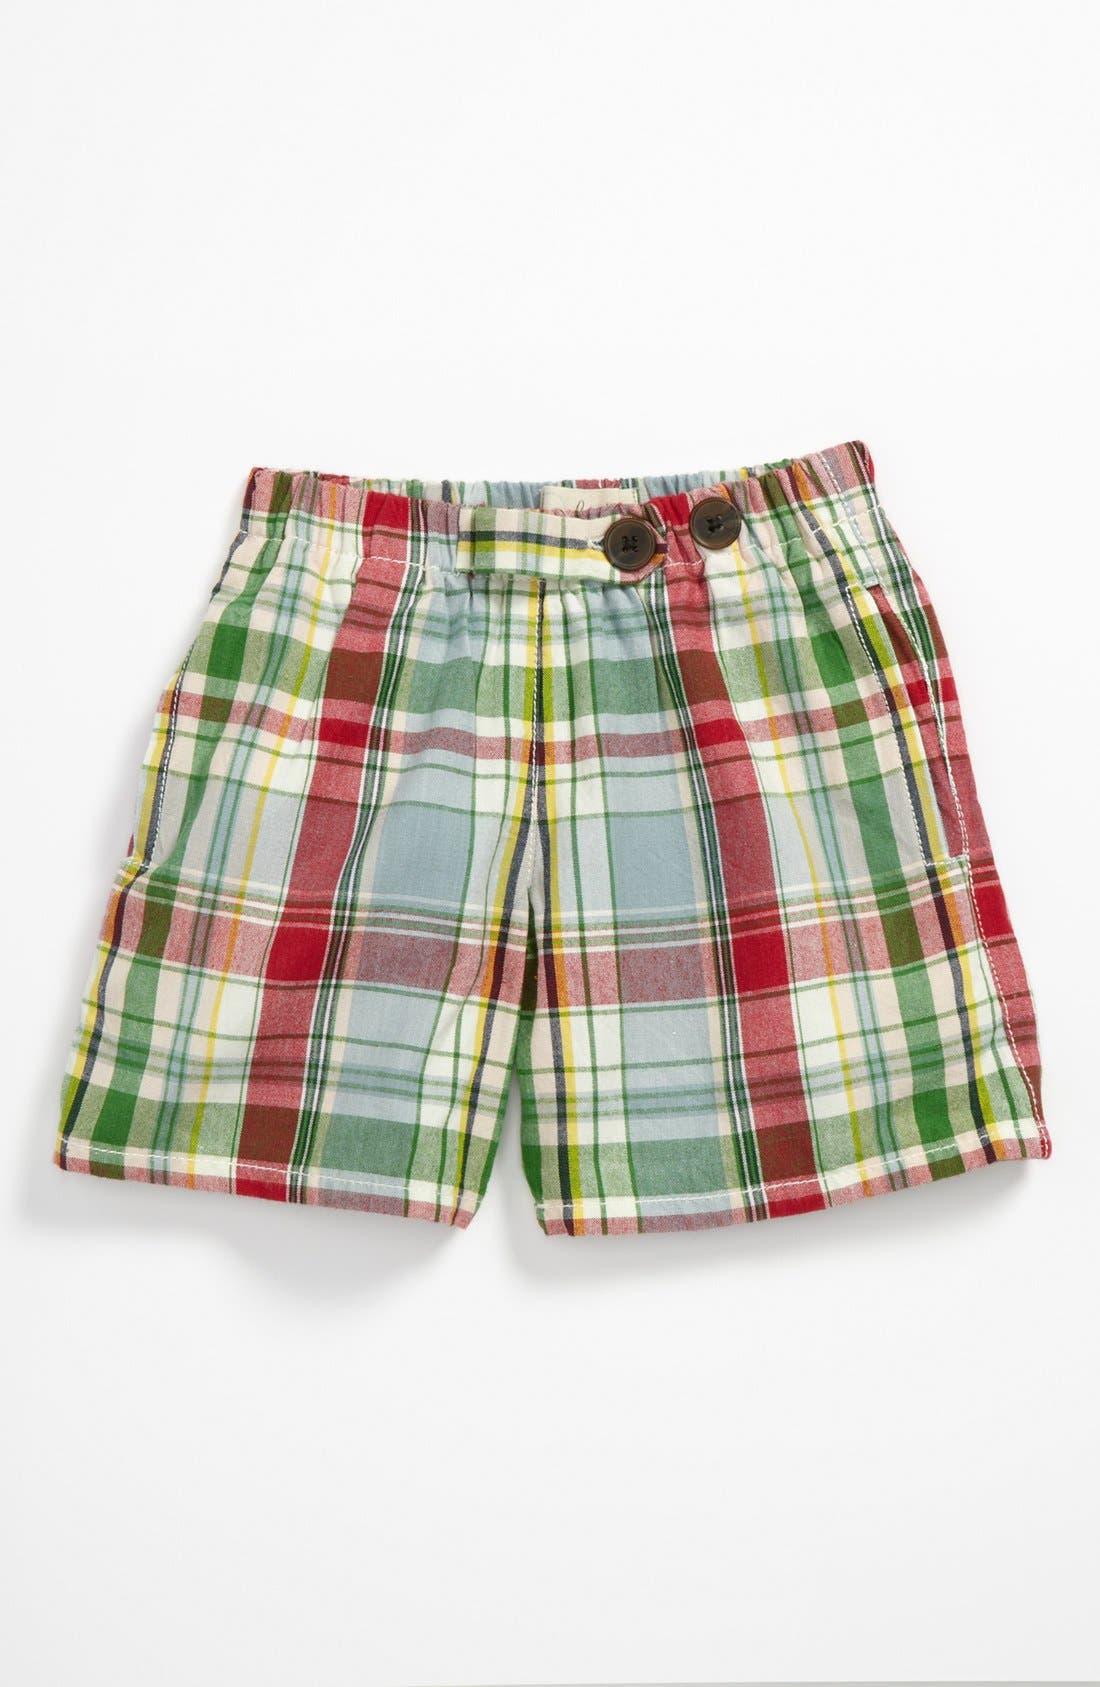 Alternate Image 1 Selected - Peek 'Lowell' Trail Shorts (Baby)